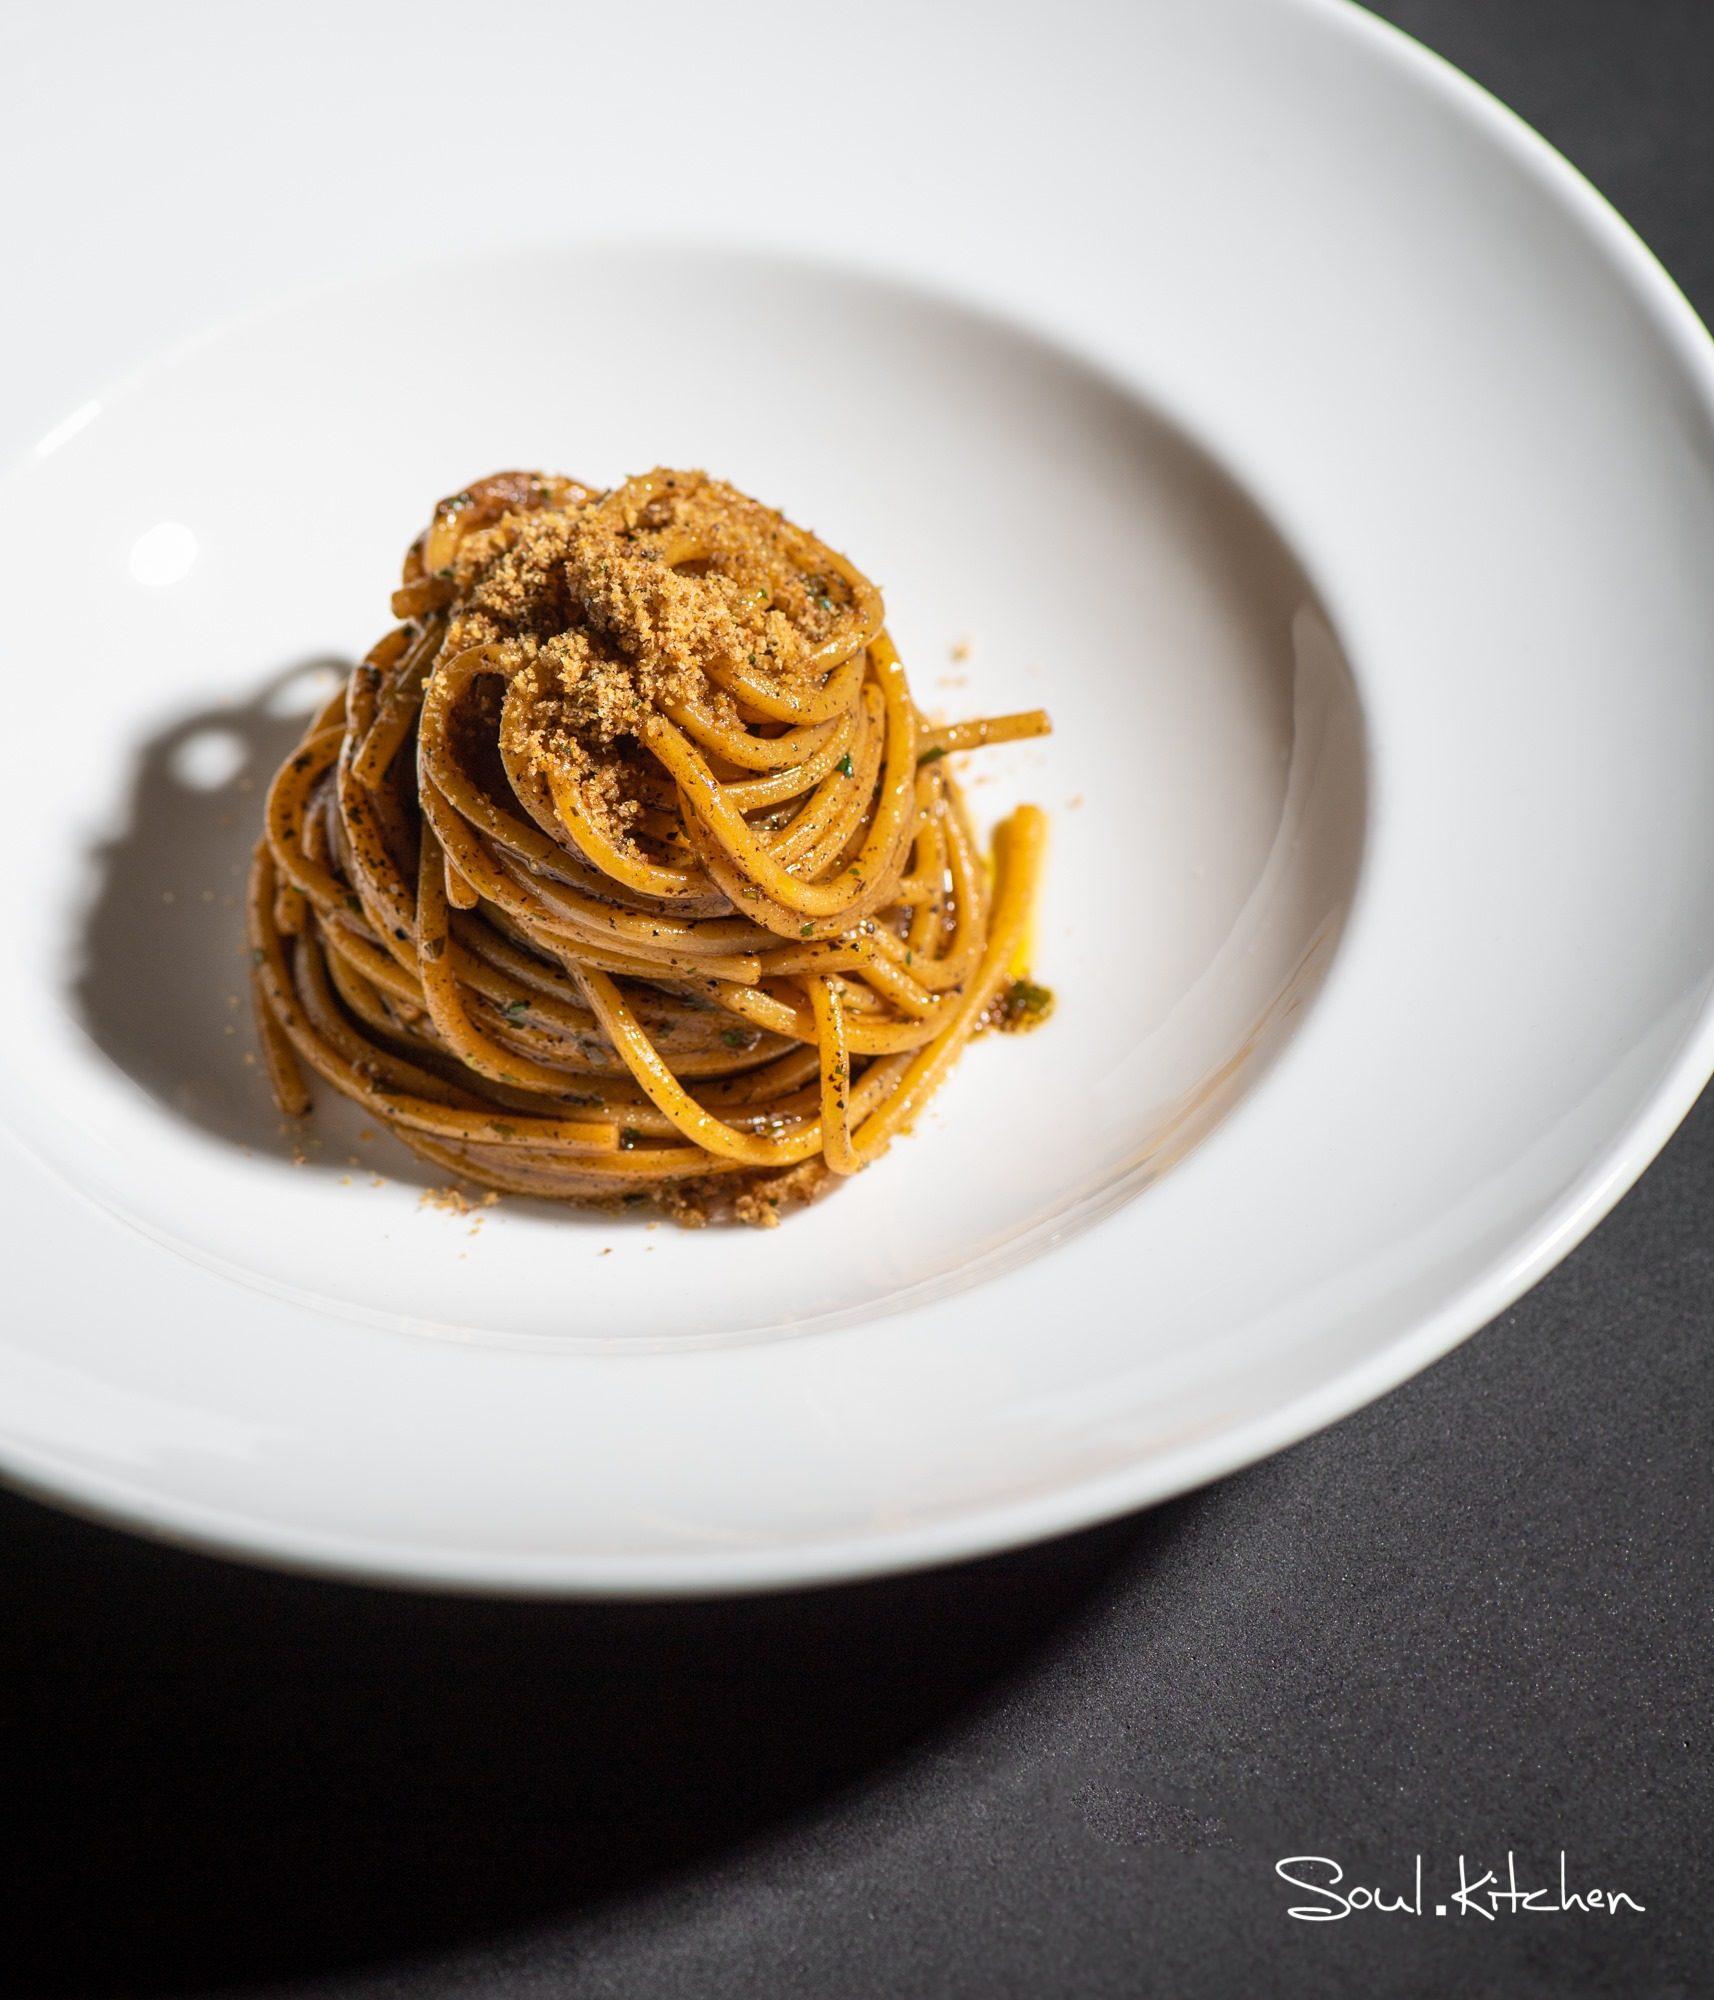 Ristoranti vegetariani gourmet: Soul Kitchen a Torino